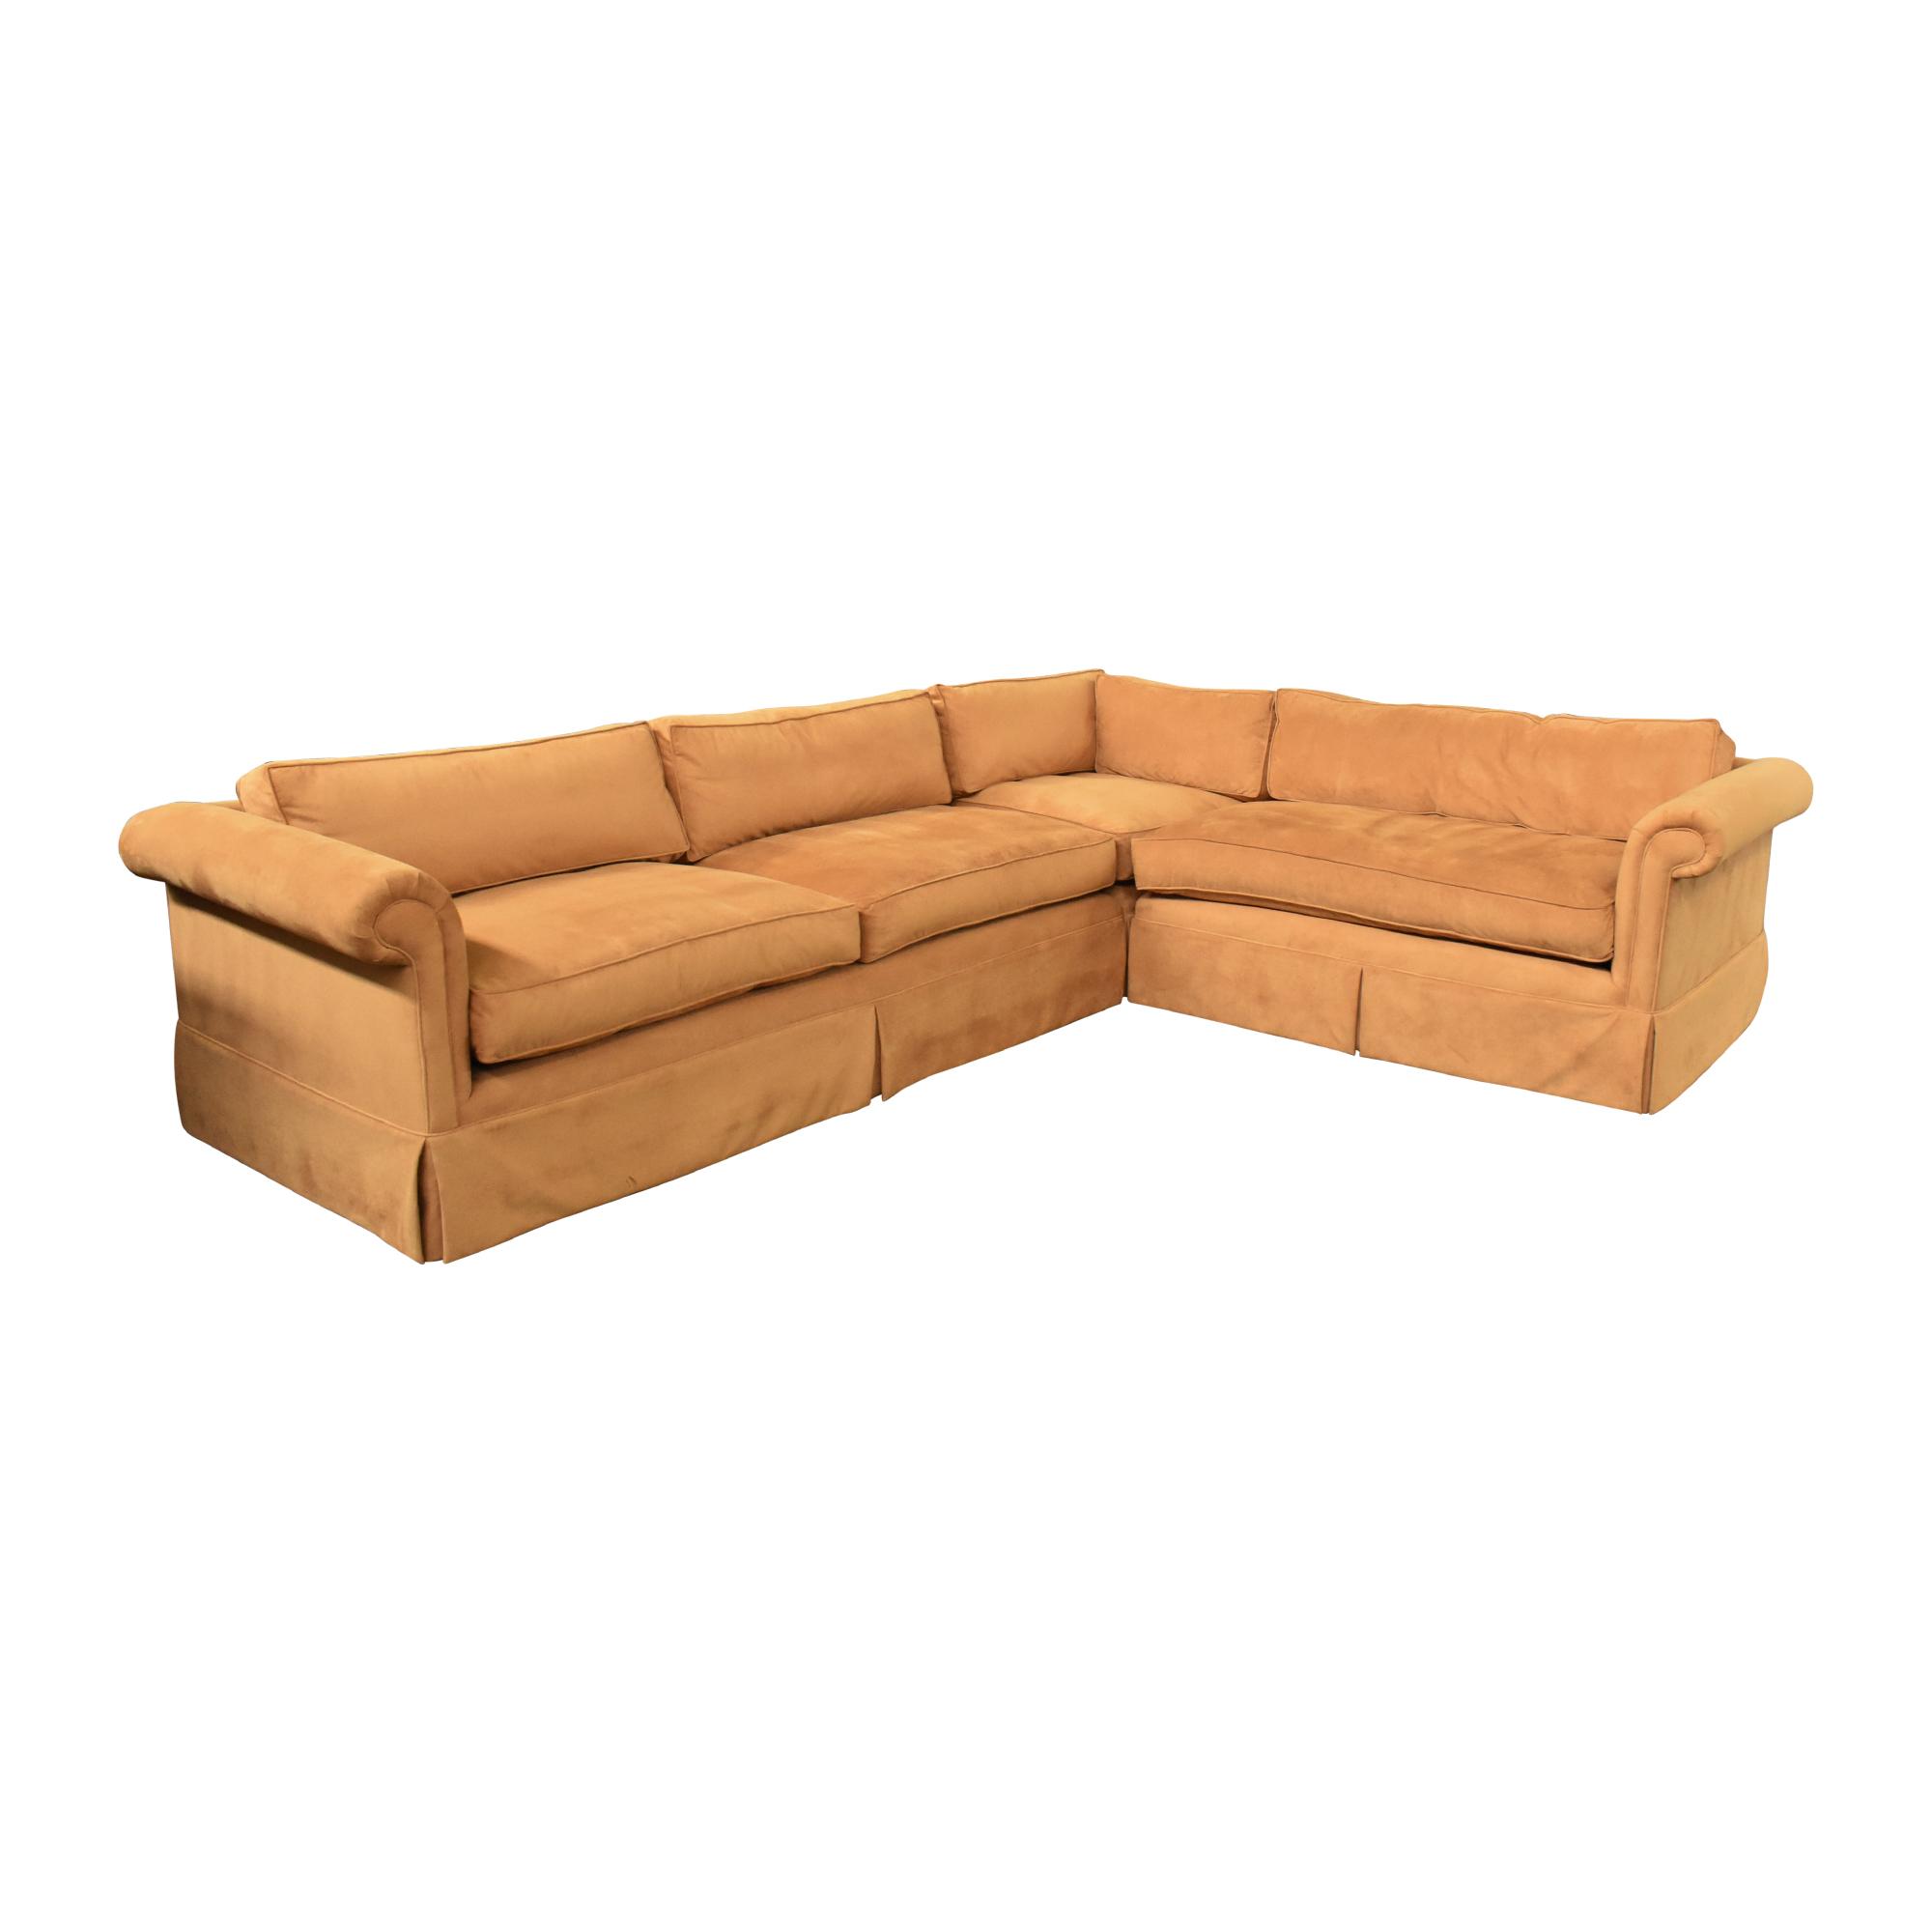 Custom Corner Sectional Sofa sale